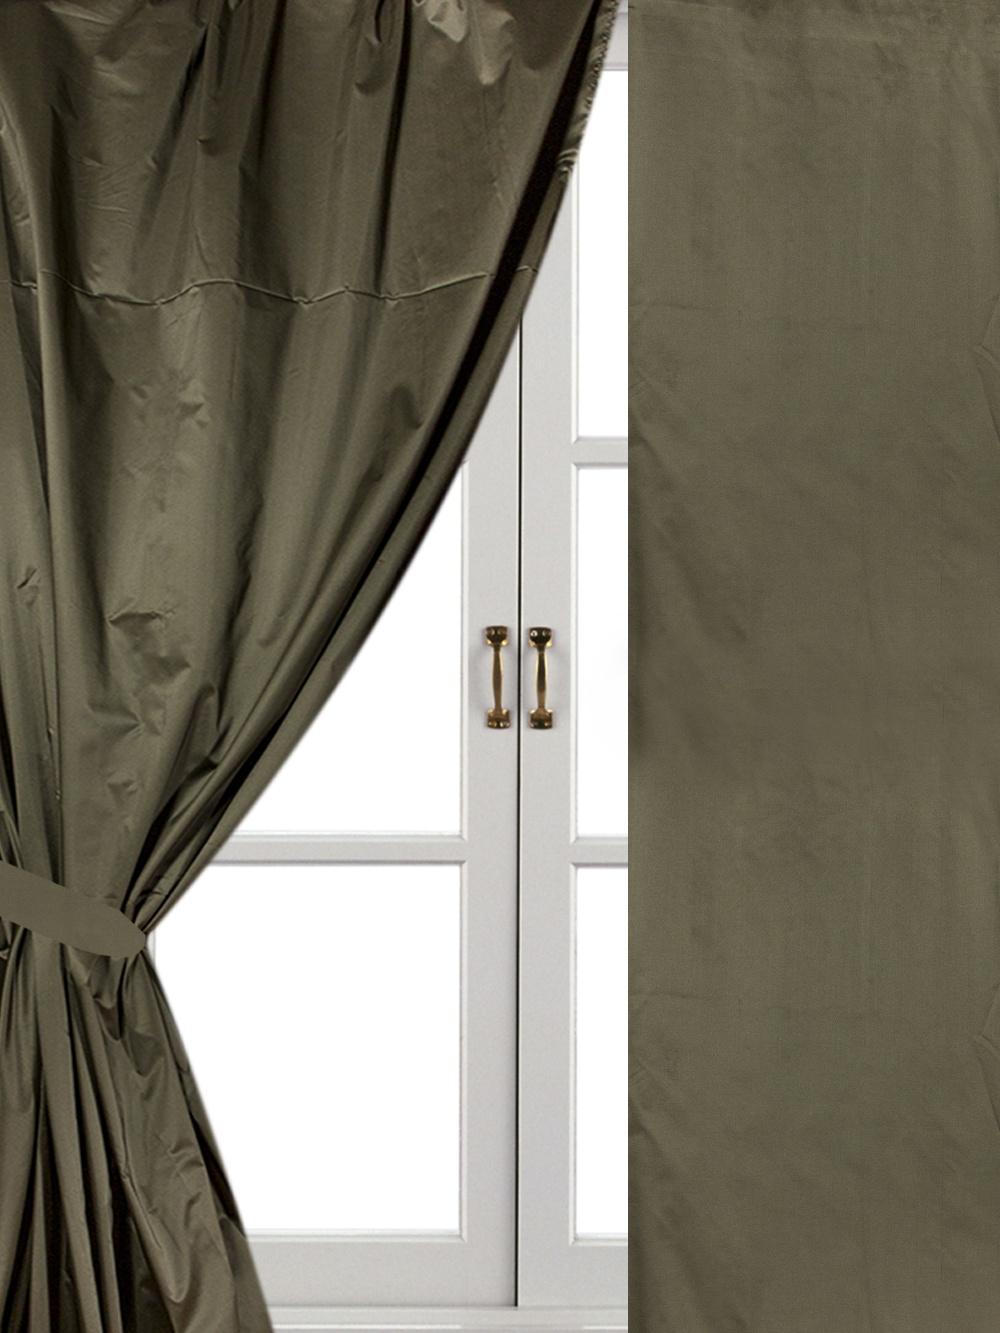 Шторы комнатные Айлант ОБ40 шторы homedeco нитяные шторы яркие кольца